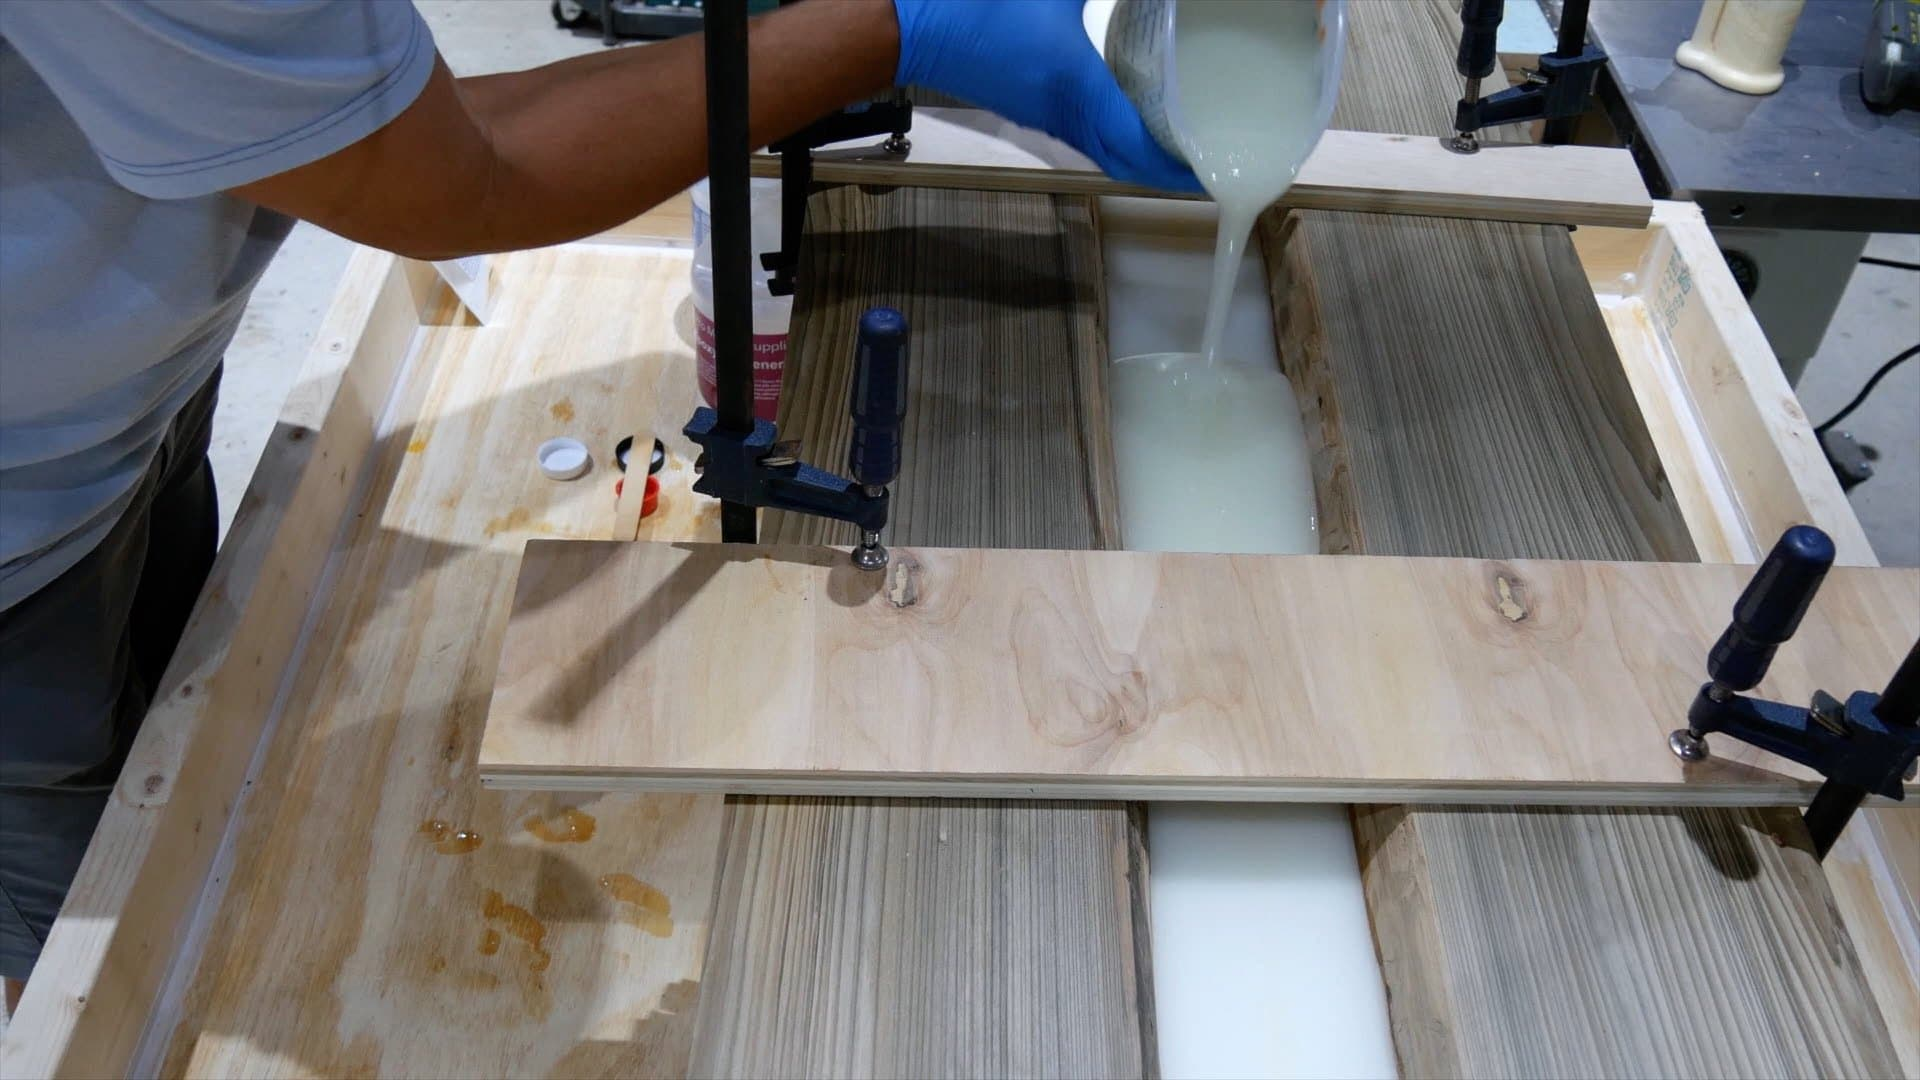 epoxy-resin-river-table-glowpowder_20171016_30